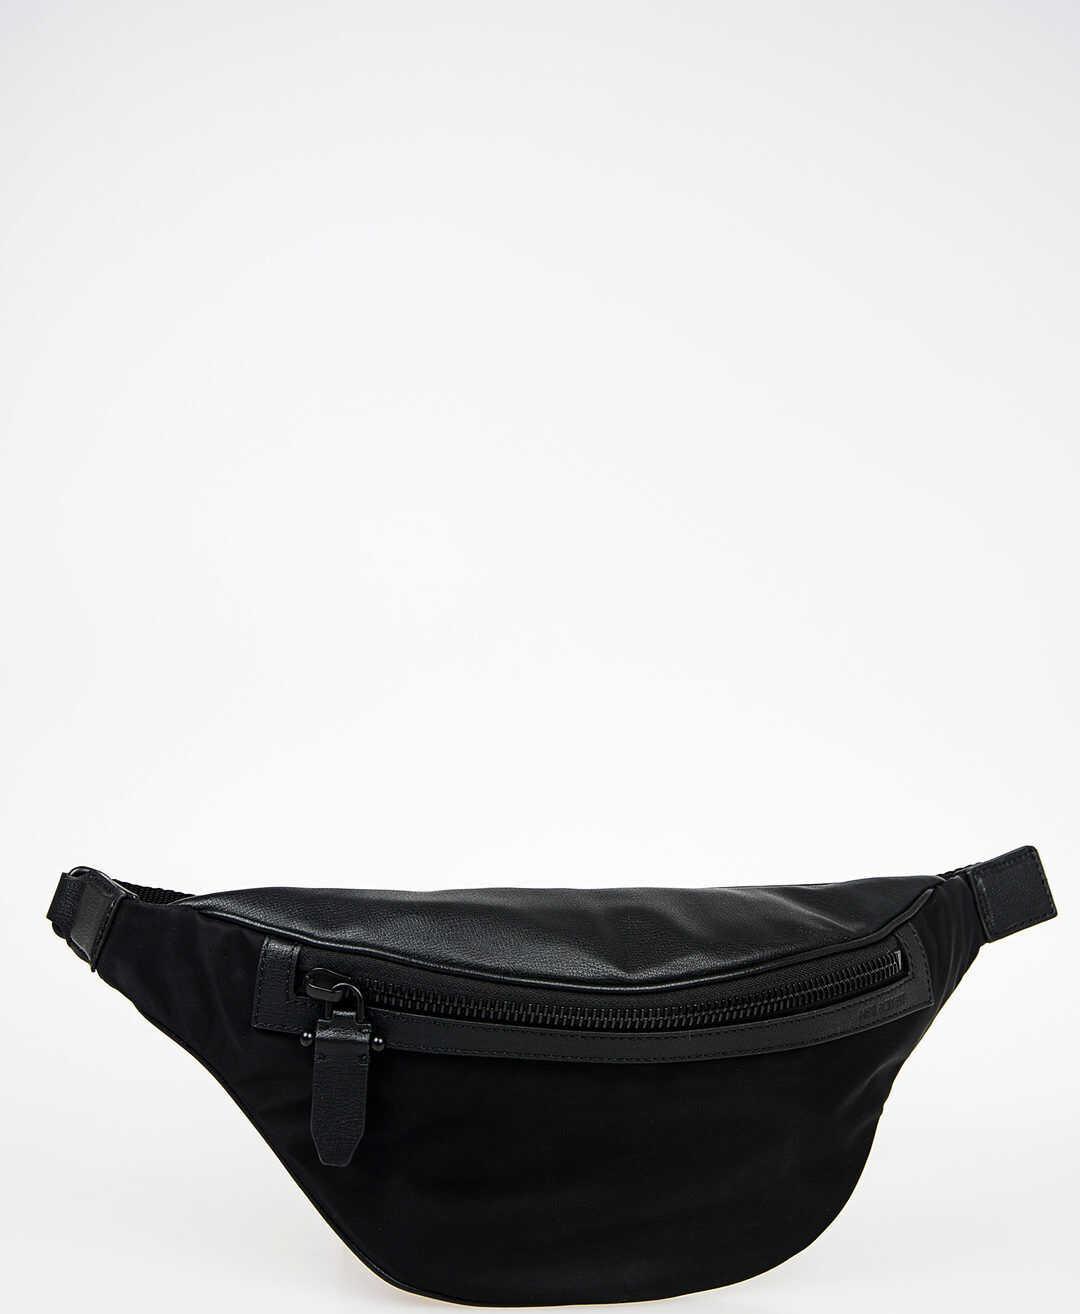 Neil Barrett Nylon and Leather Bum Bag BLACK